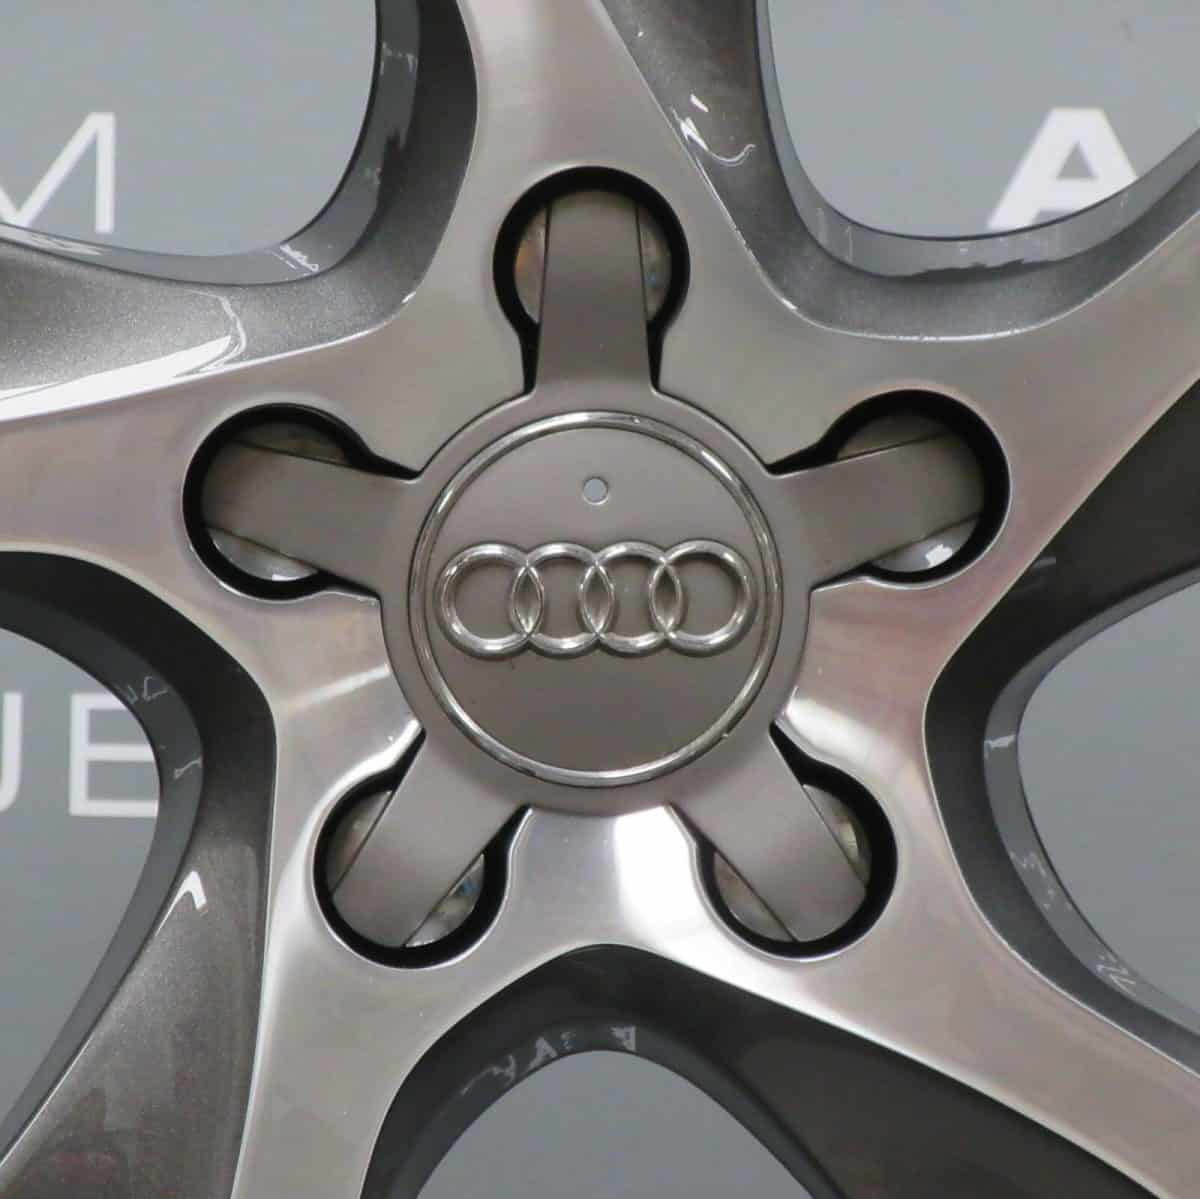 "Genuine Audi A3 S3 RS3 8V 5 Twist Spoke 18"" Inch Alloy Wheels With Grey & Diamond Turned Finish 8V0 601 025 CC"